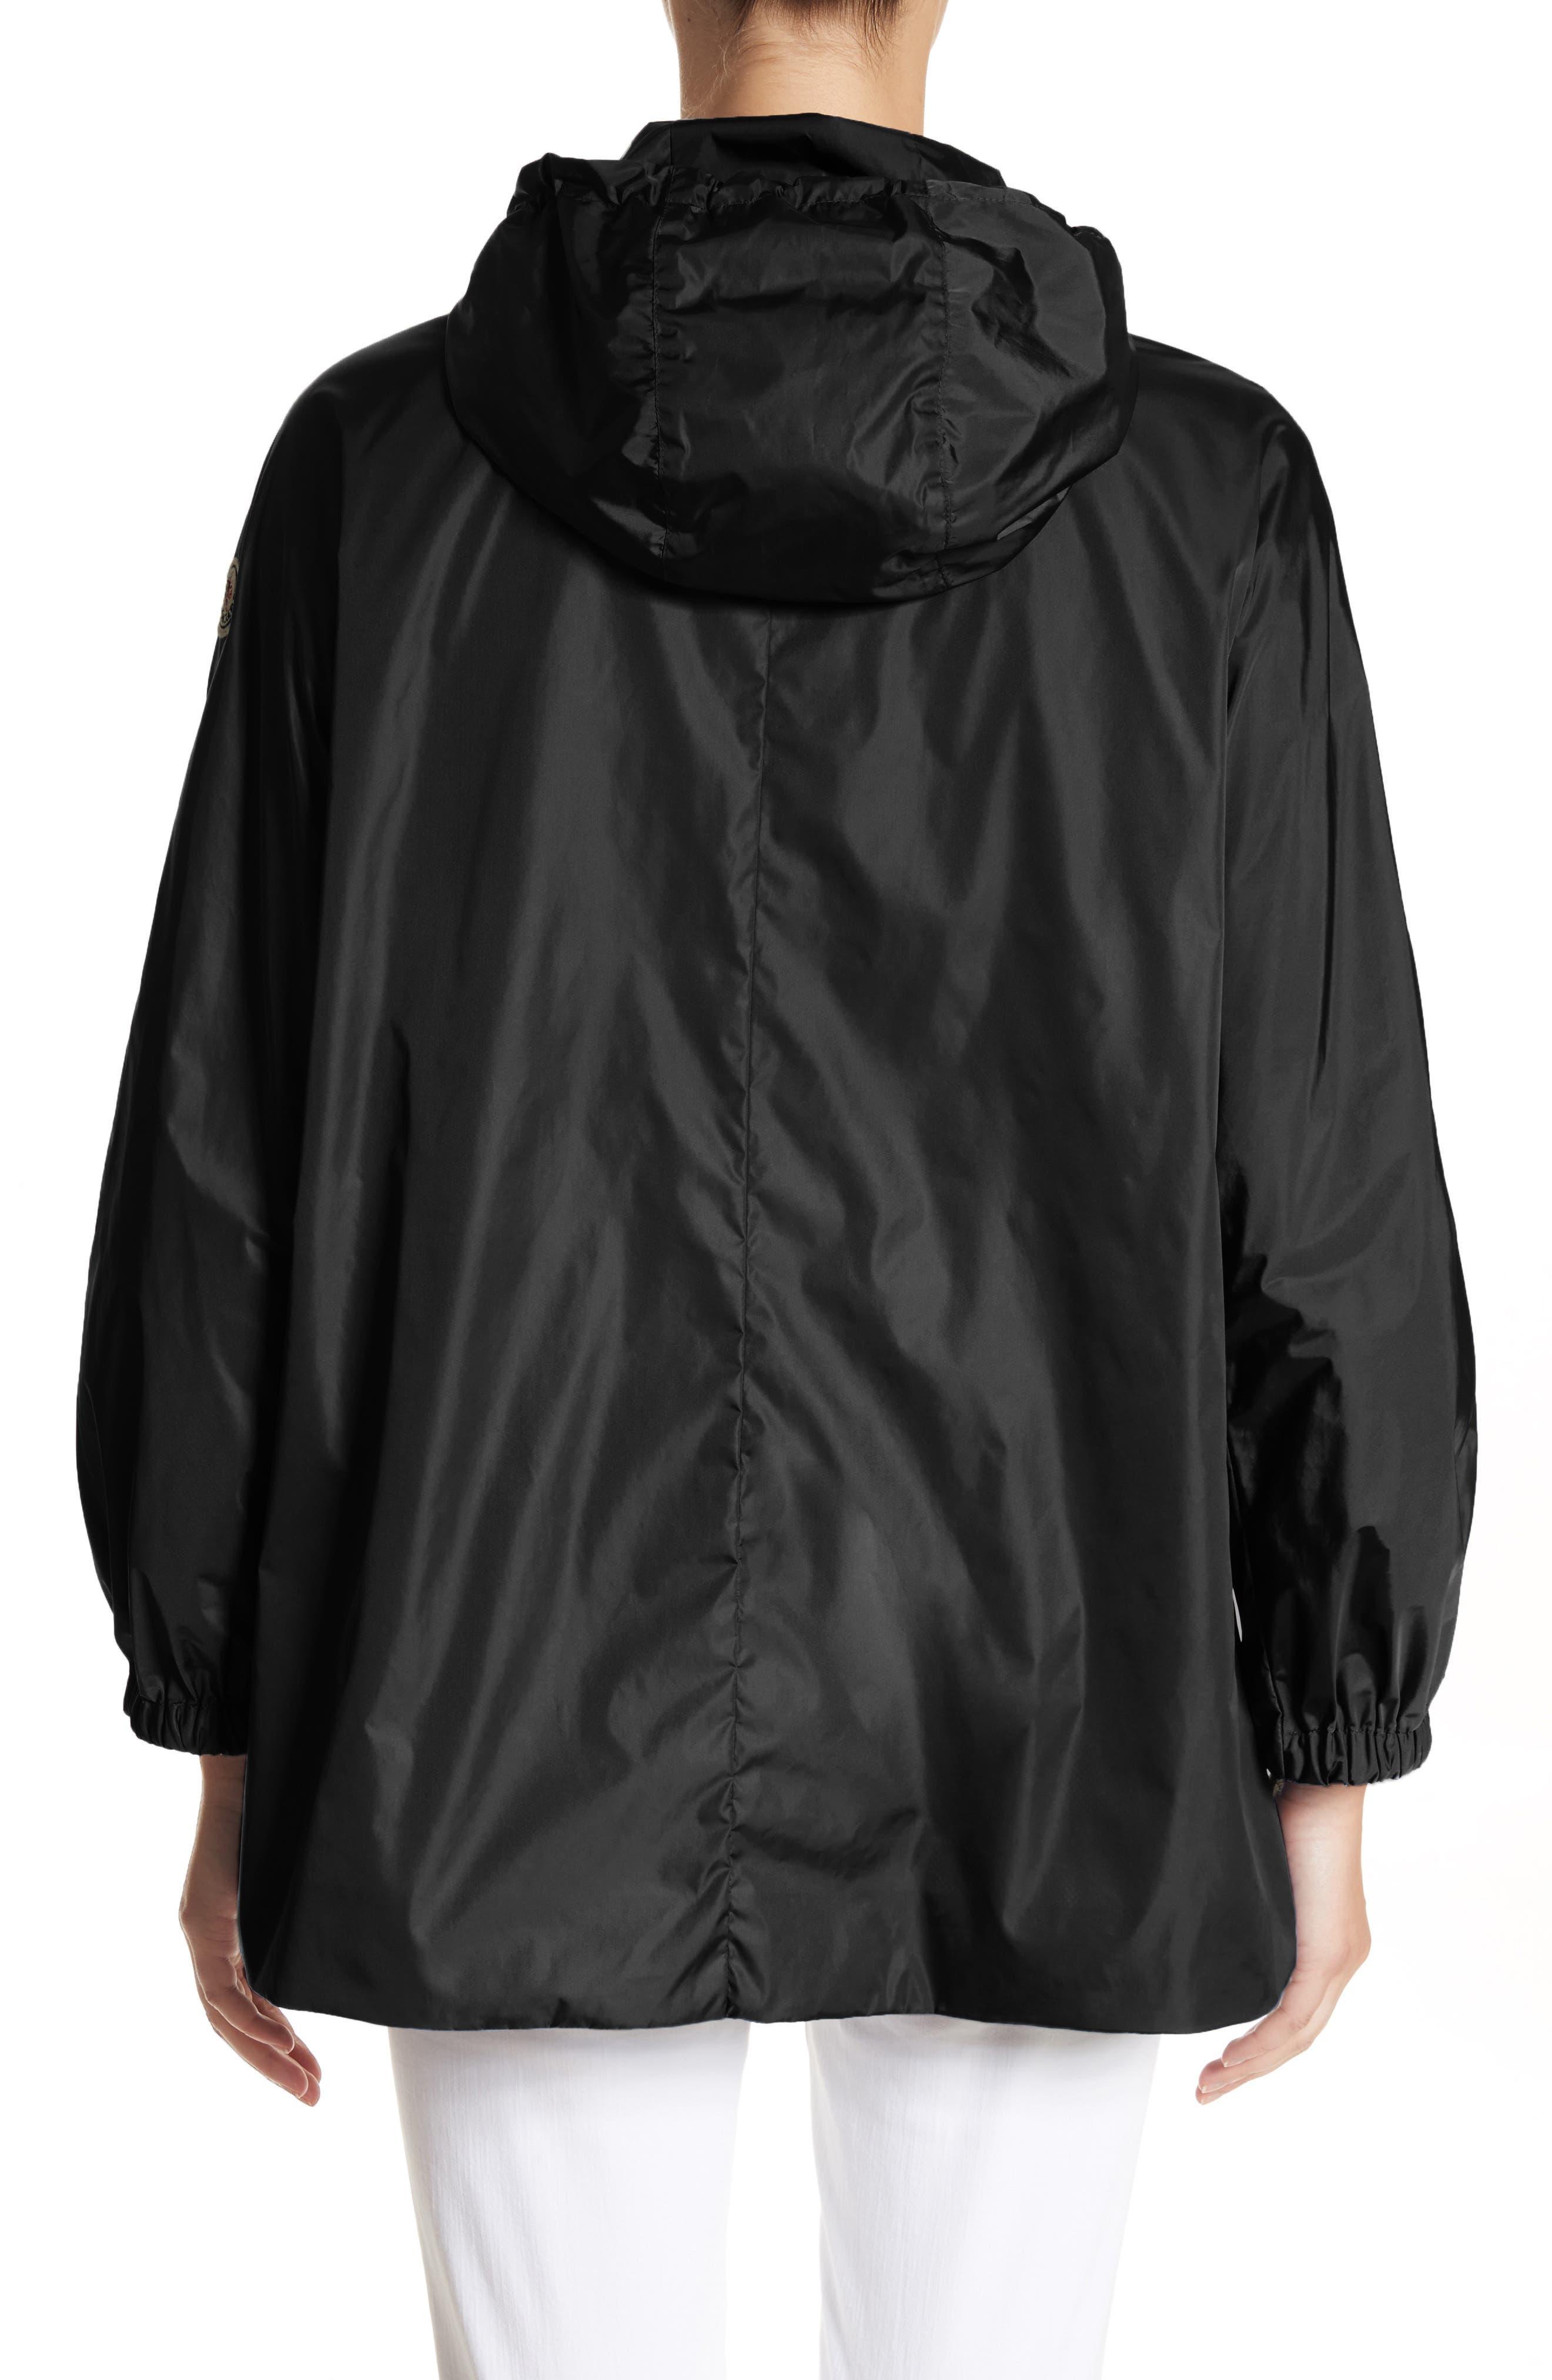 Sanvel Water Resistant Coat,                             Alternate thumbnail 2, color,                             Black